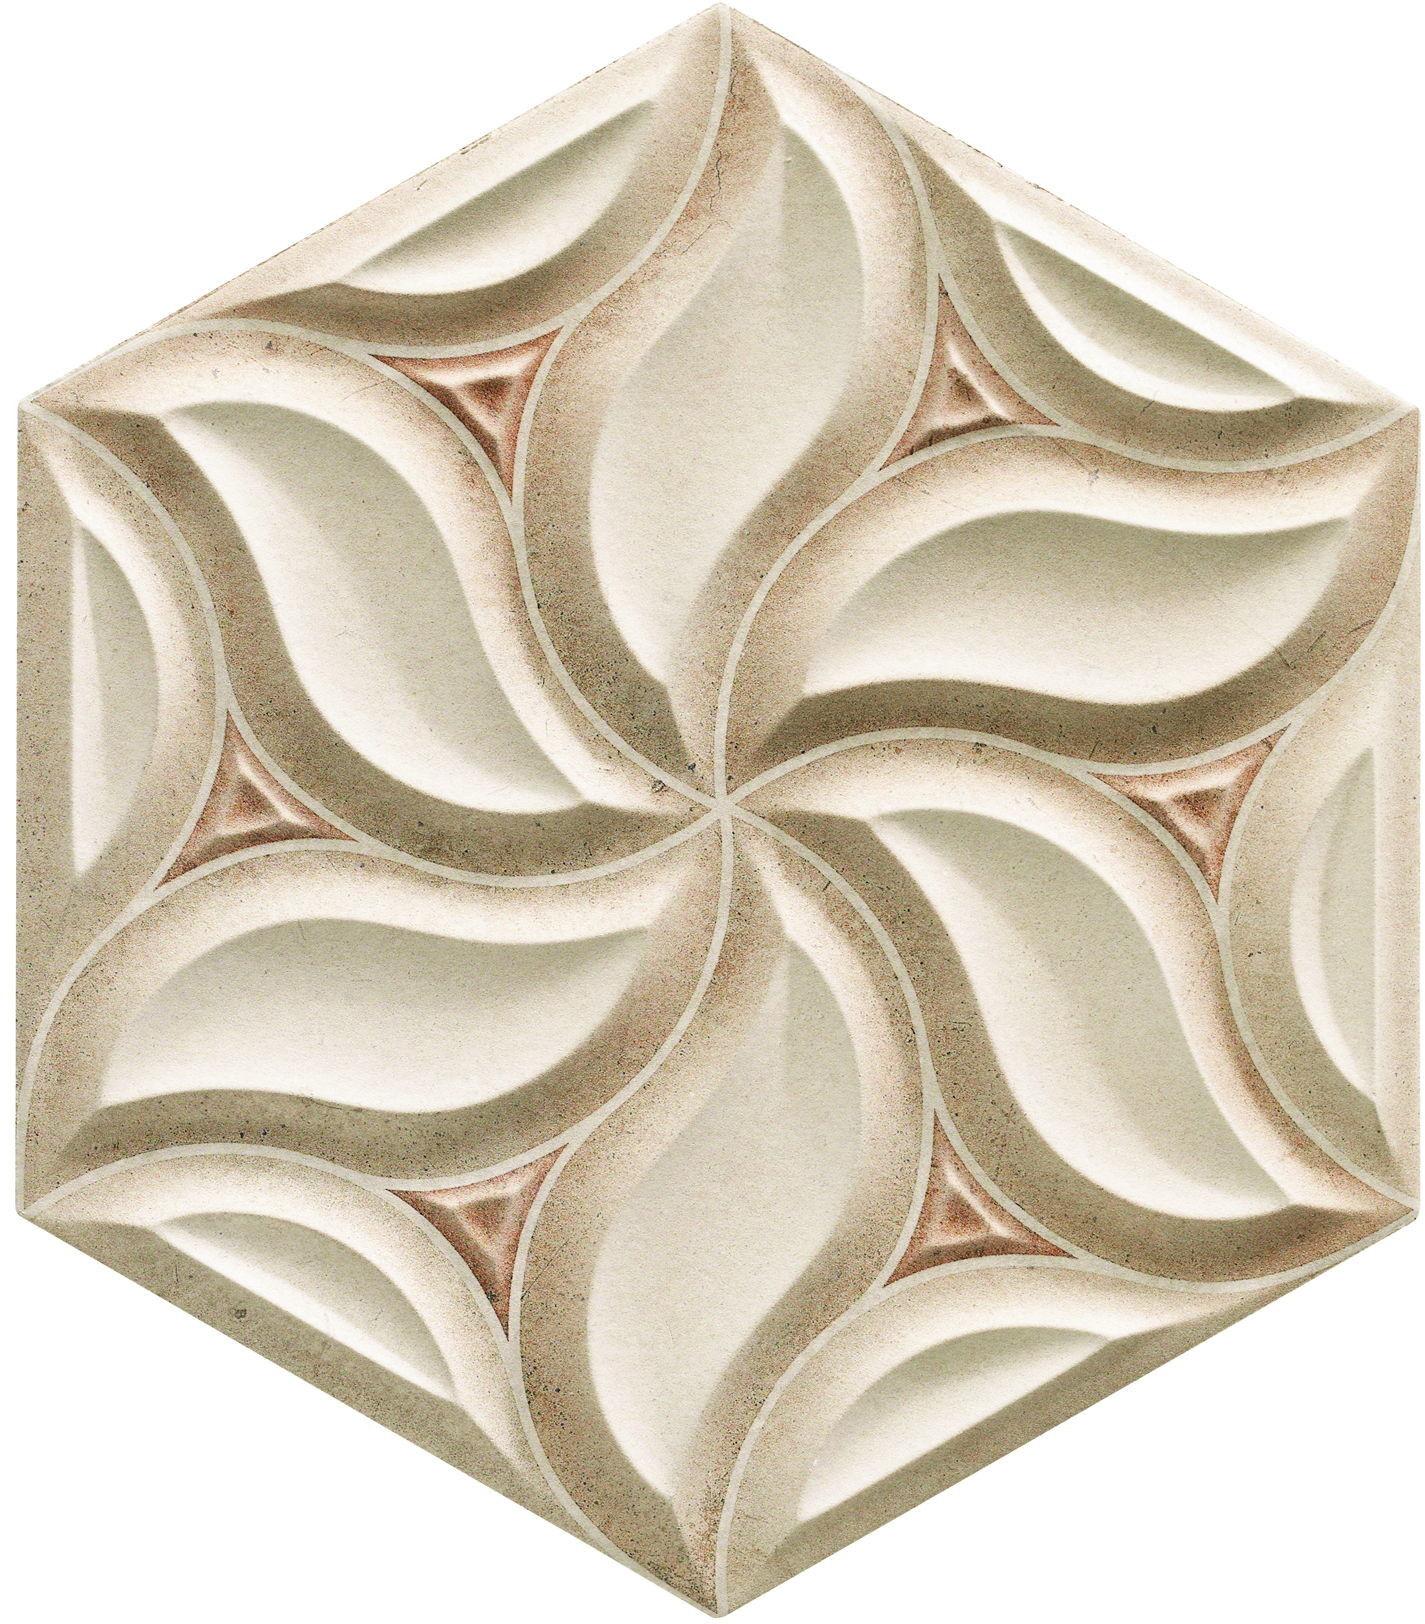 Habitat Ivy Sand 28,5x33 płytka ścienna heksagonalna